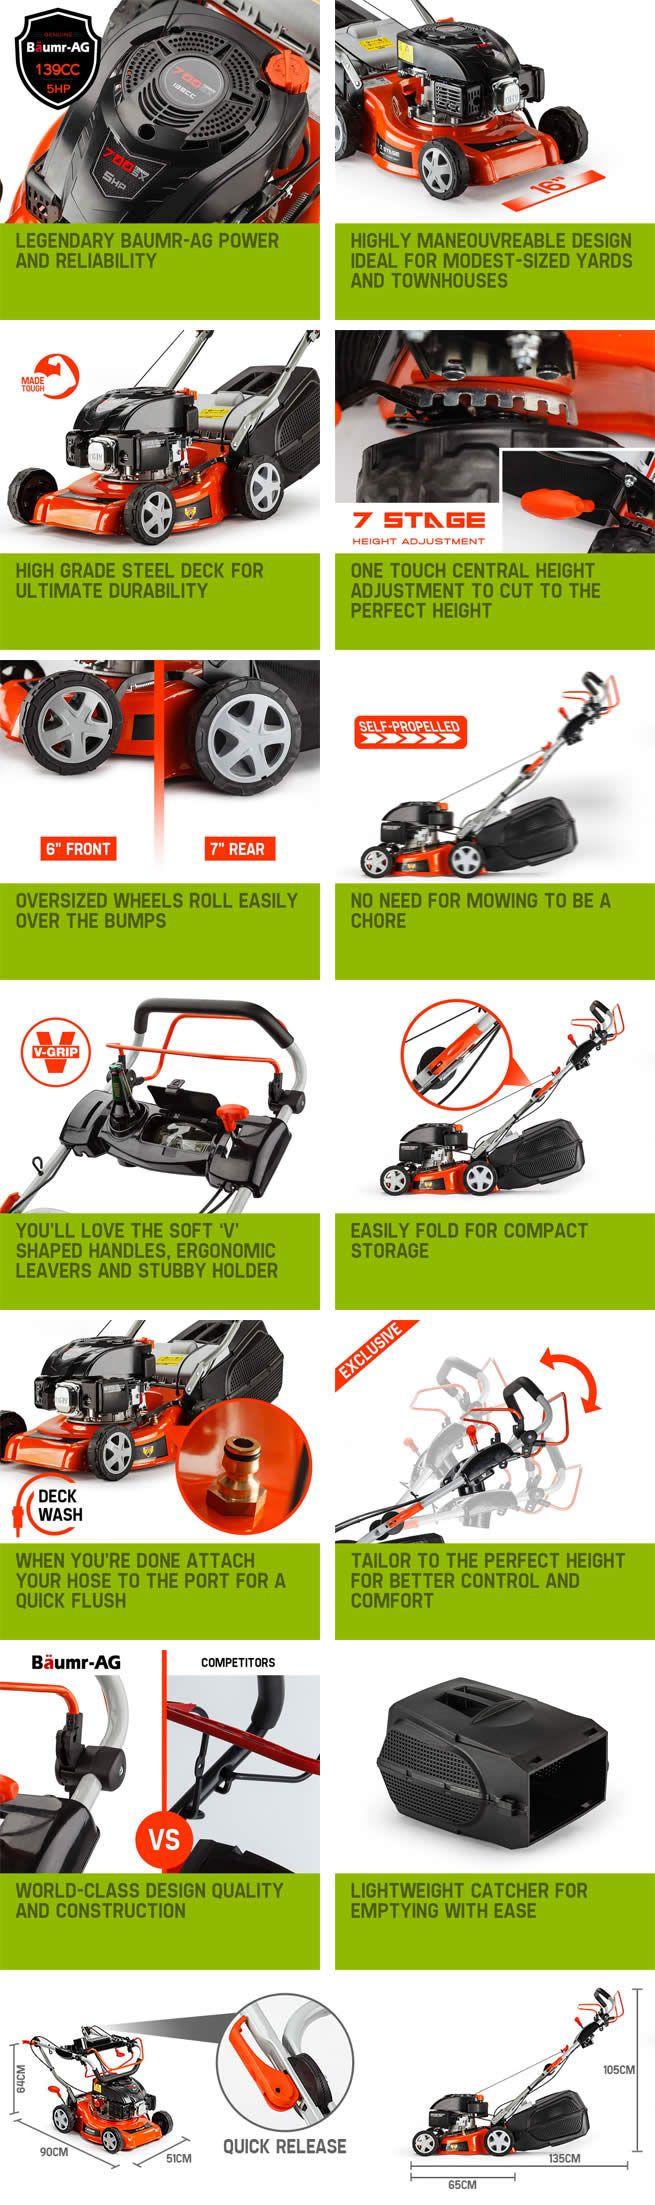 baumr ag lawn mower manual